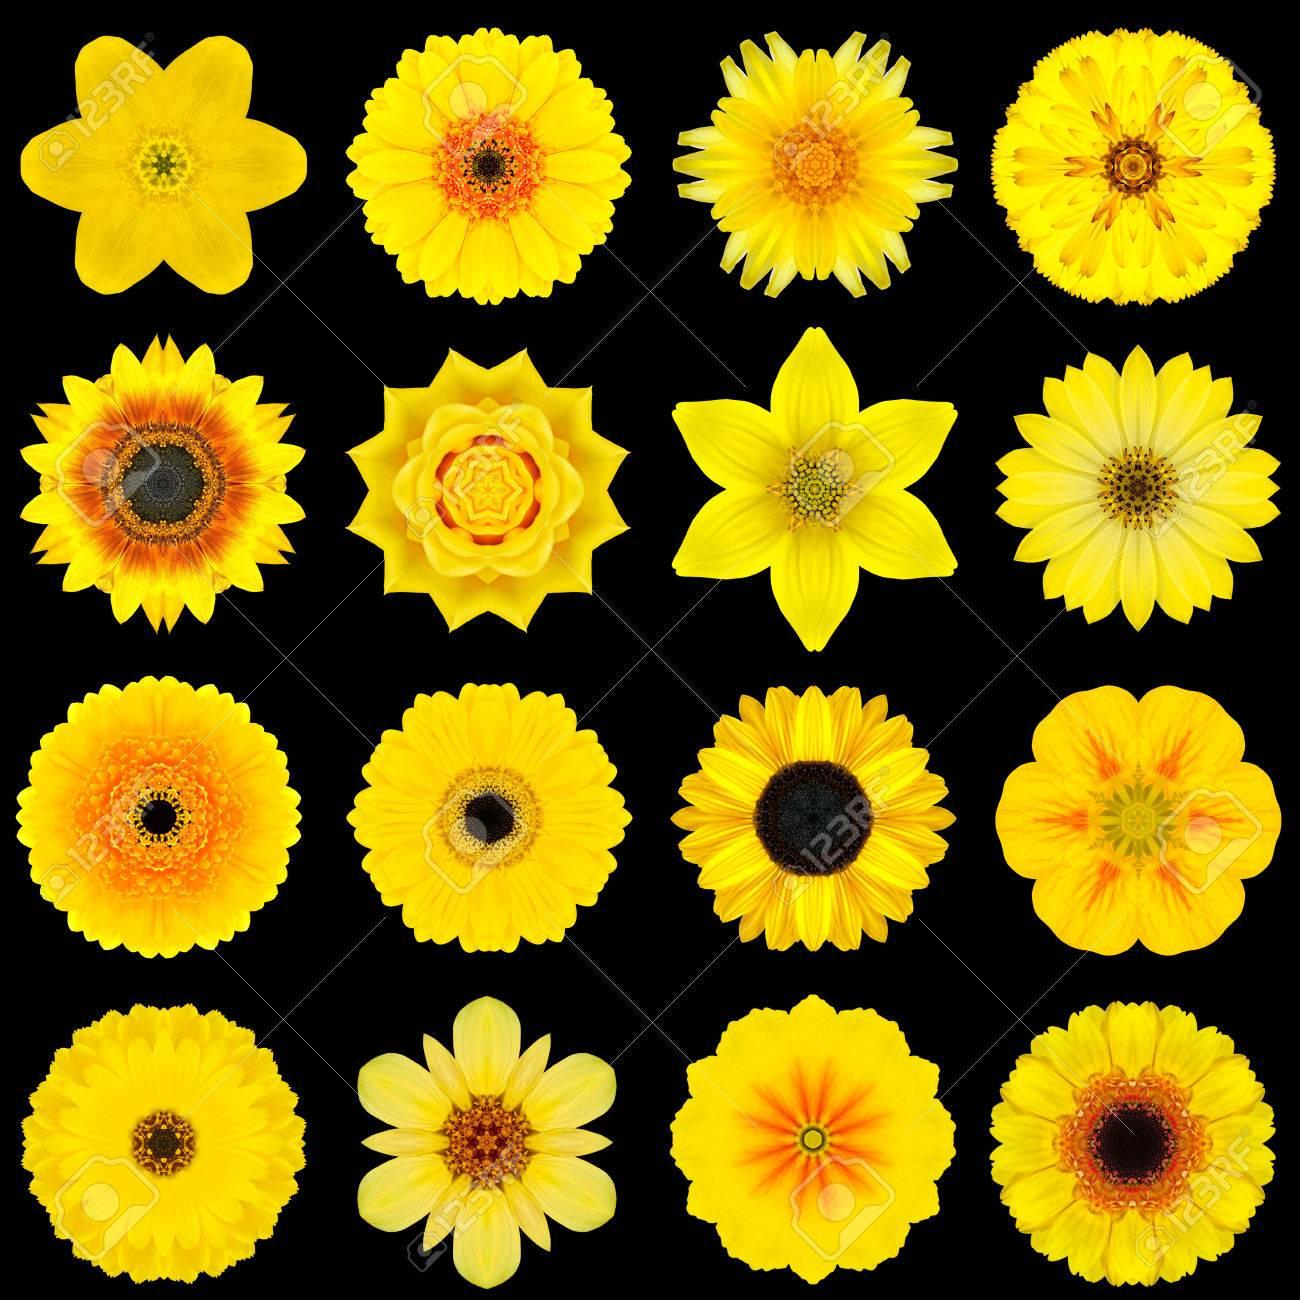 Big Collection Of Various Yellow Flowers Kaleidoscopic Mandala